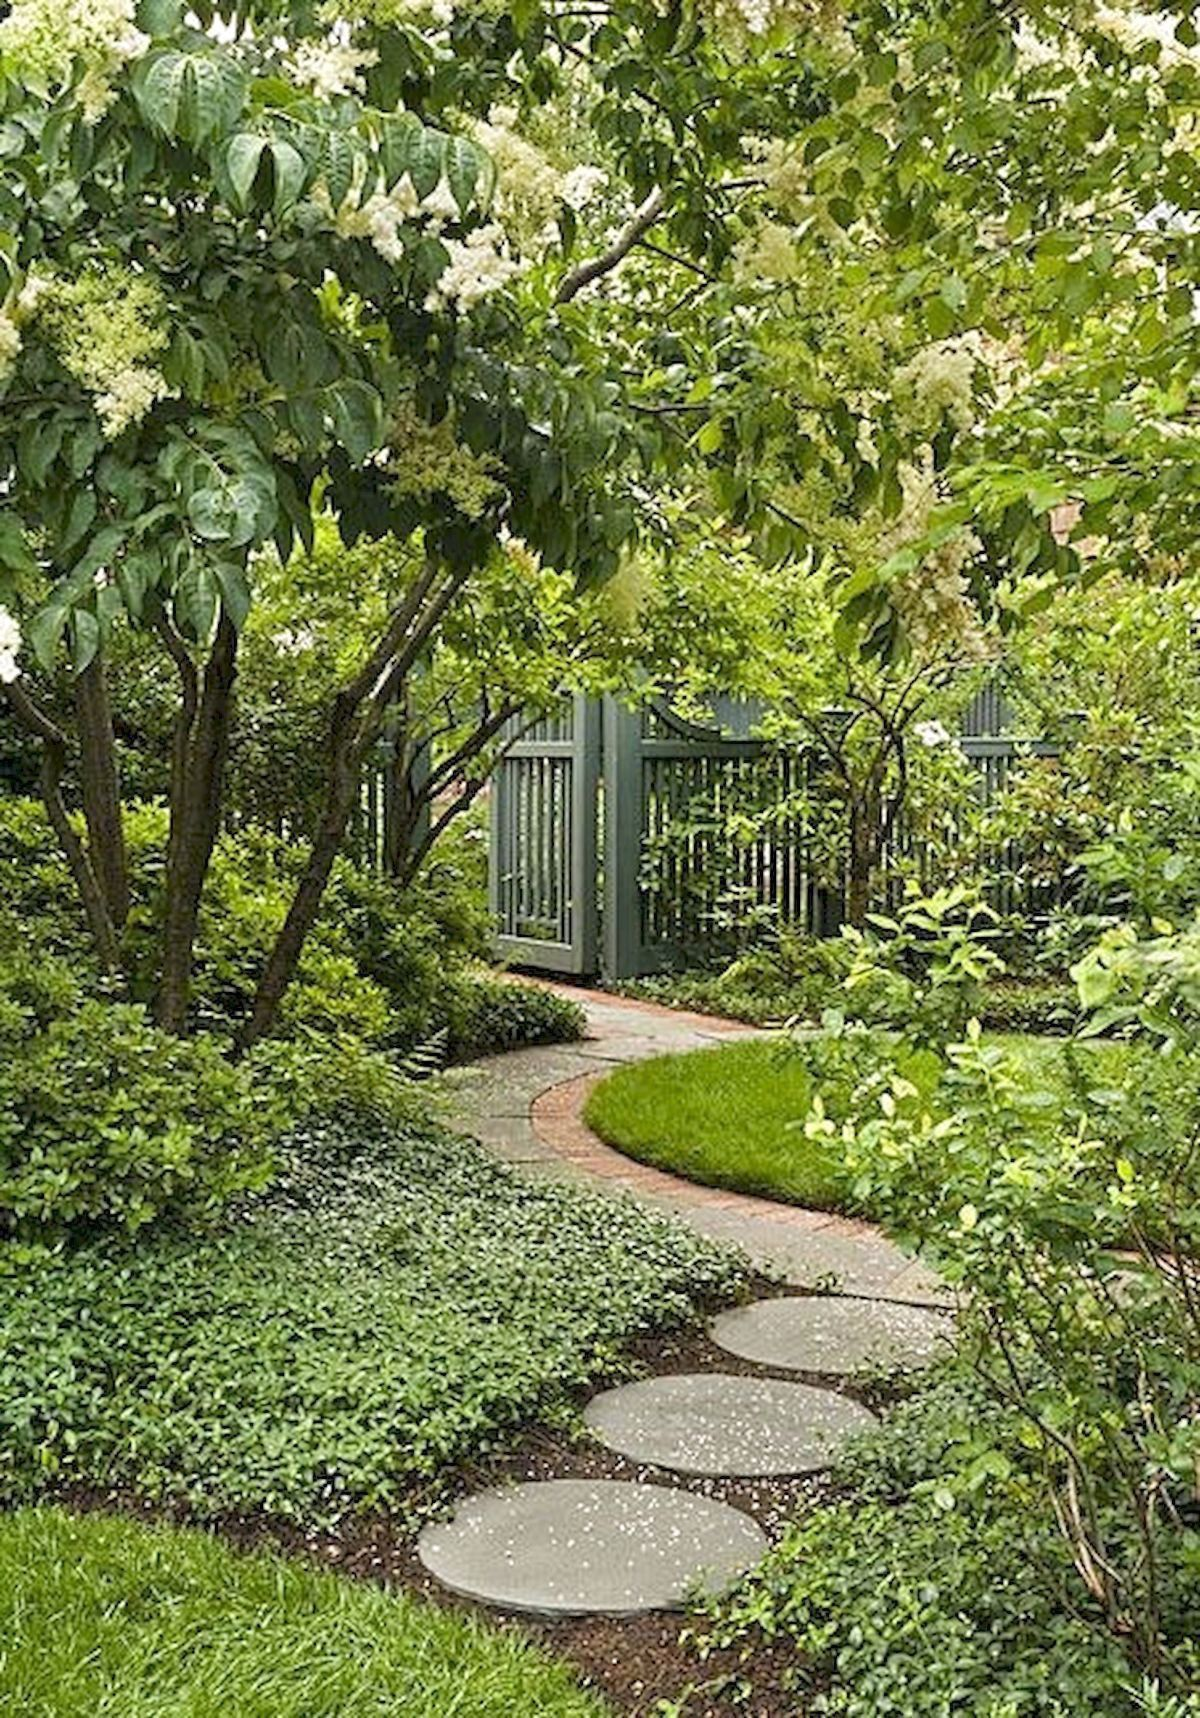 77 Favourite Pinterest Garden Decor Ideas Backyard Garden Design Small Garden Design Beautiful Gardens